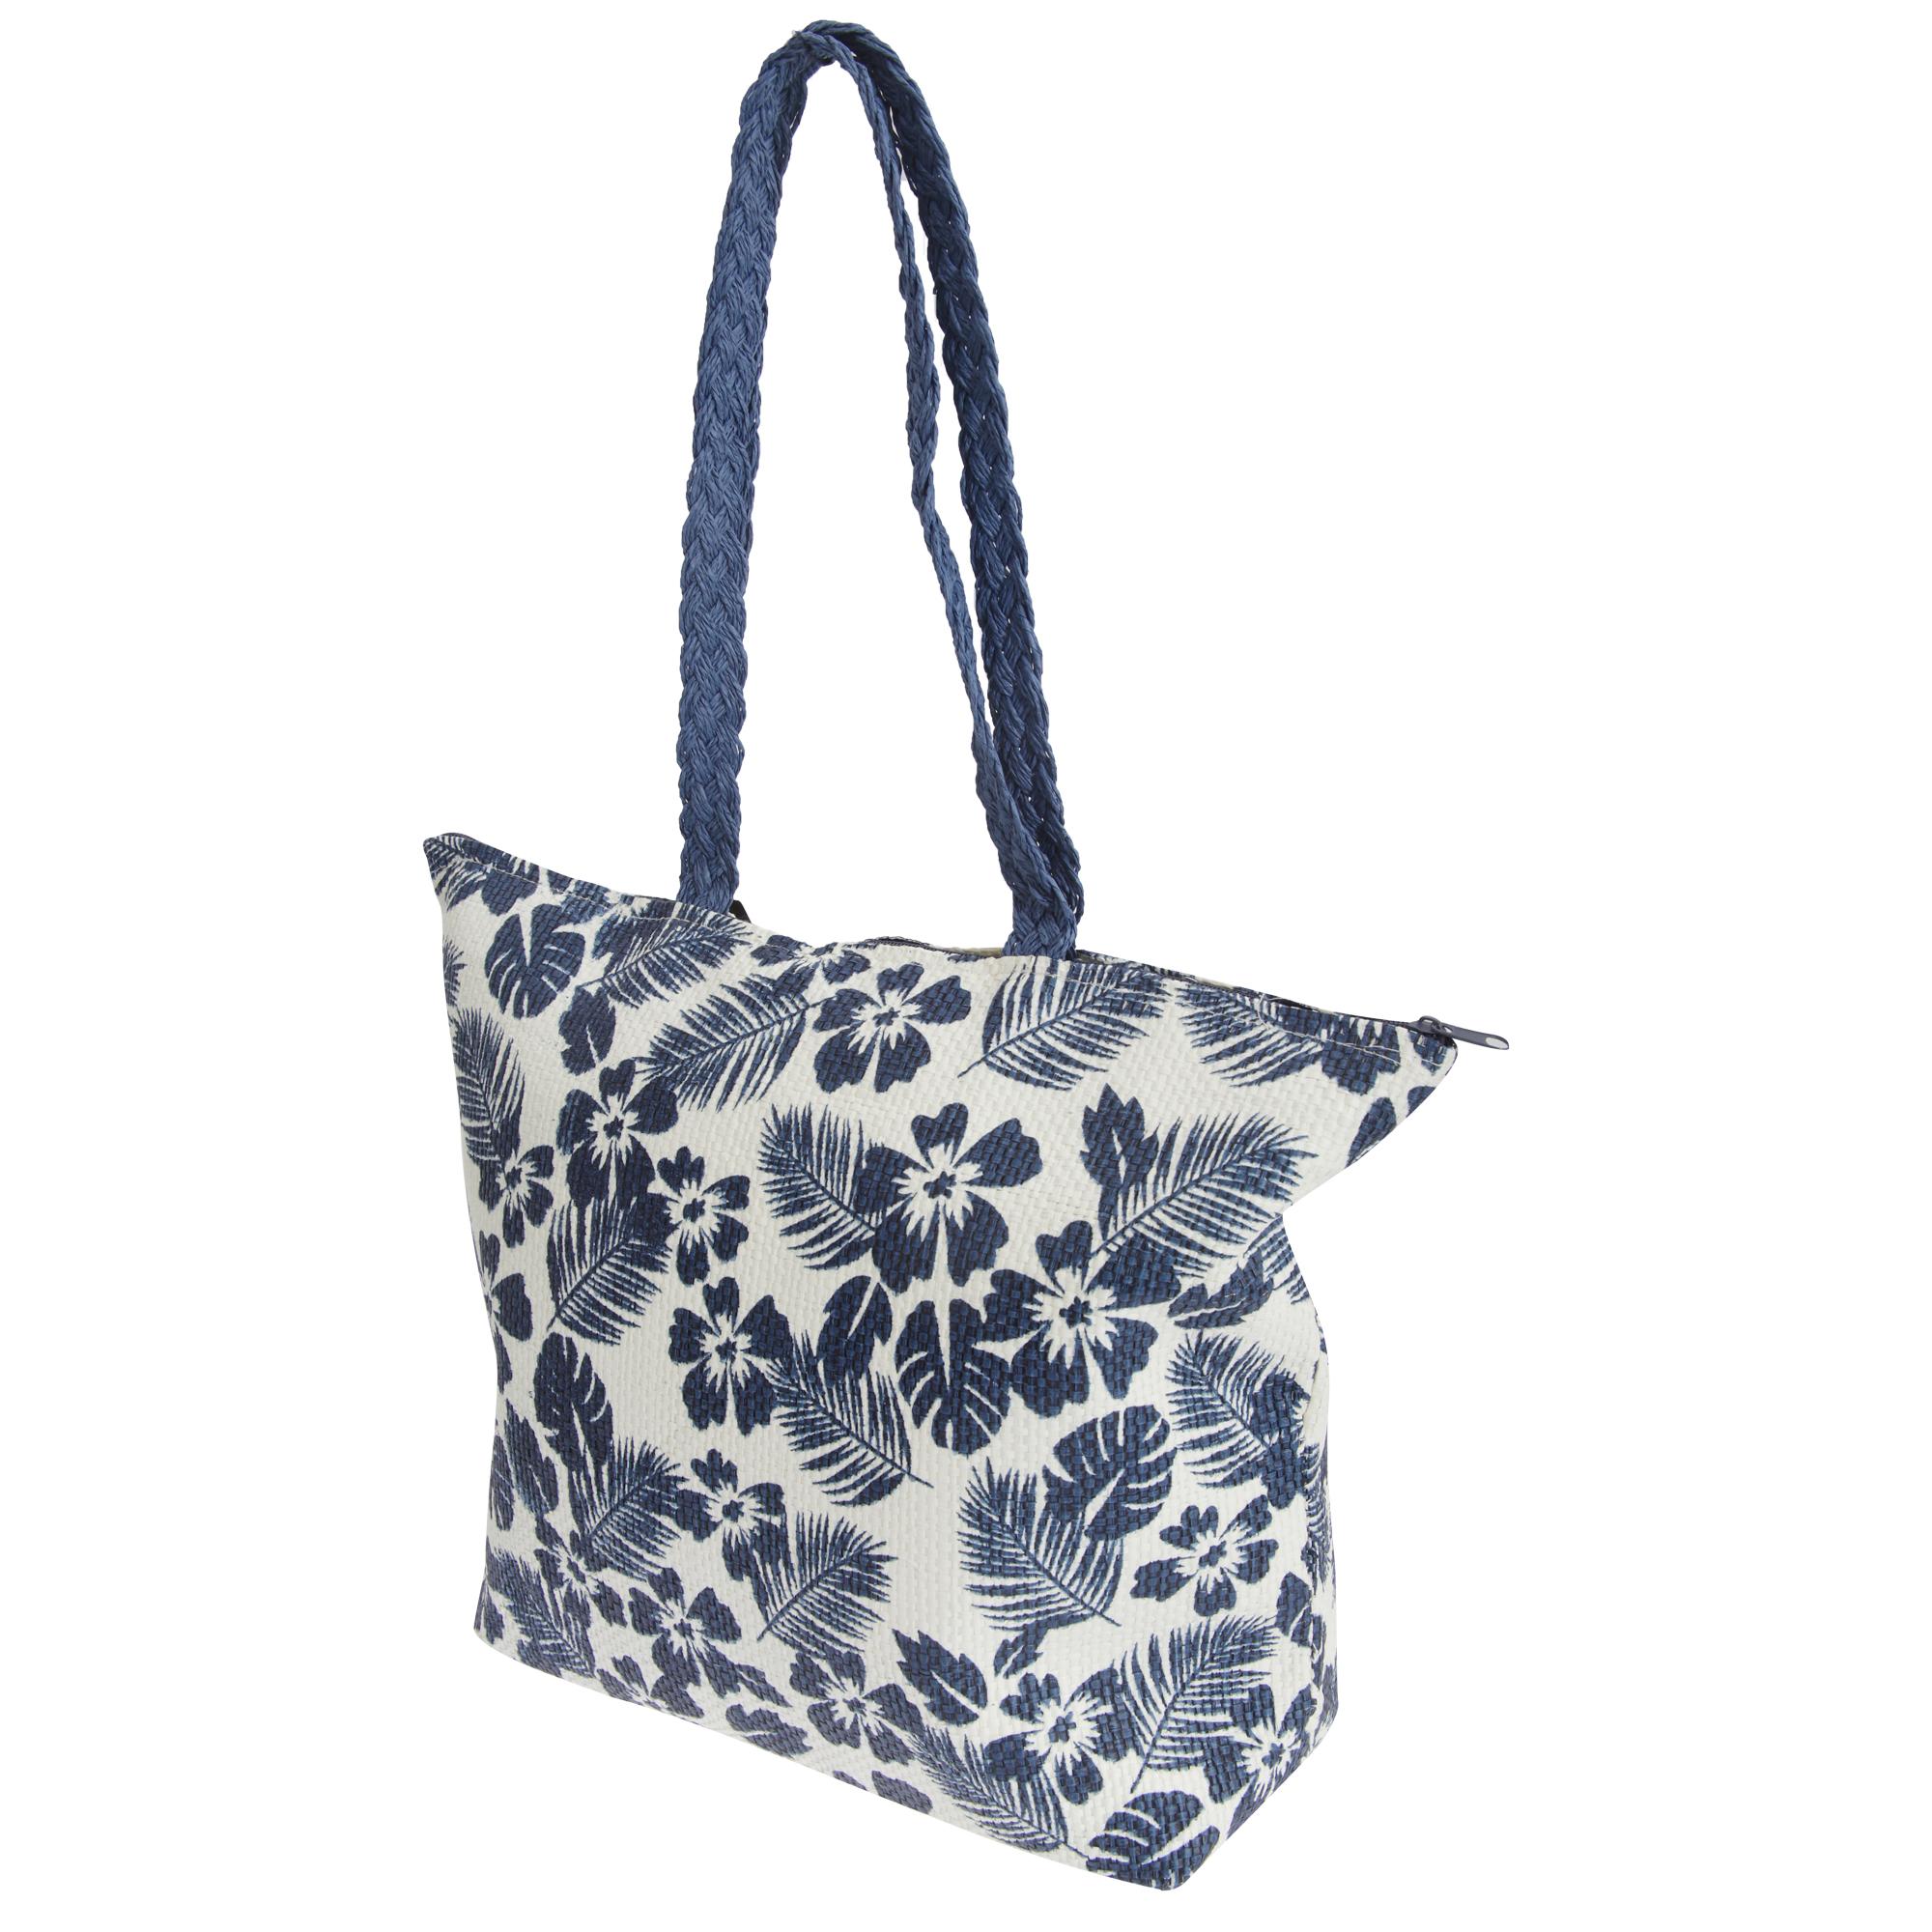 FLOSO Womens/Ladies Floral Leaf Pattern Straw Woven Summer Handbag (One Size) (White/Navy)